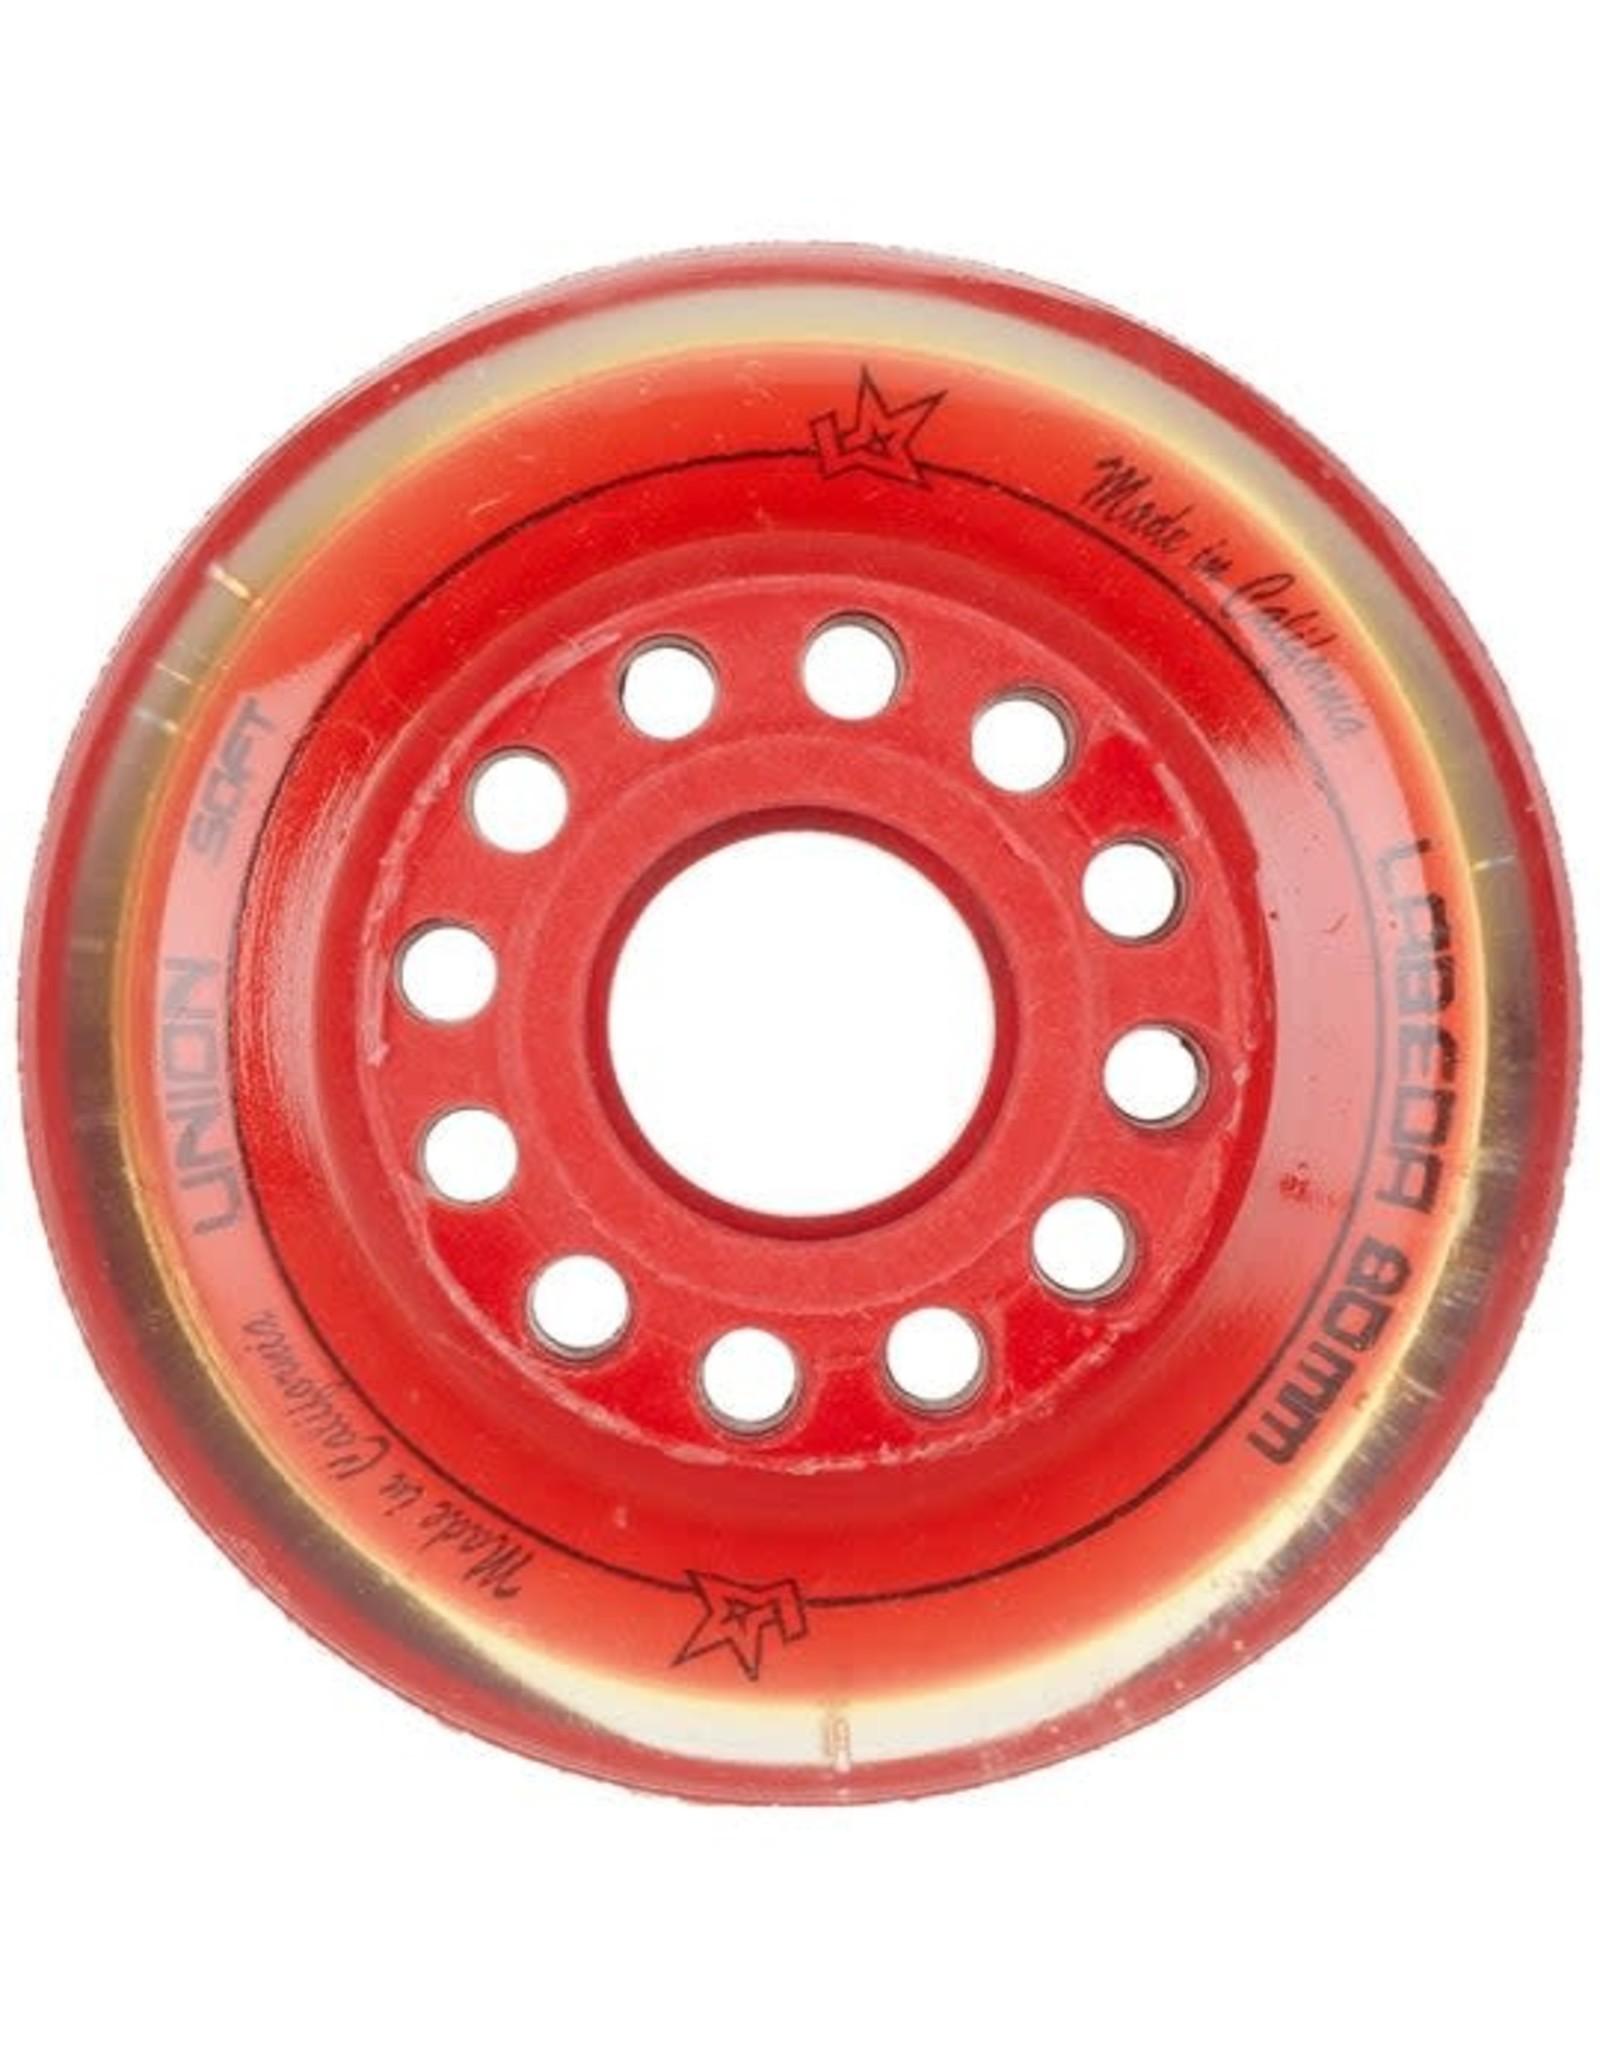 Labeda Labeda Union Wheels (RED)